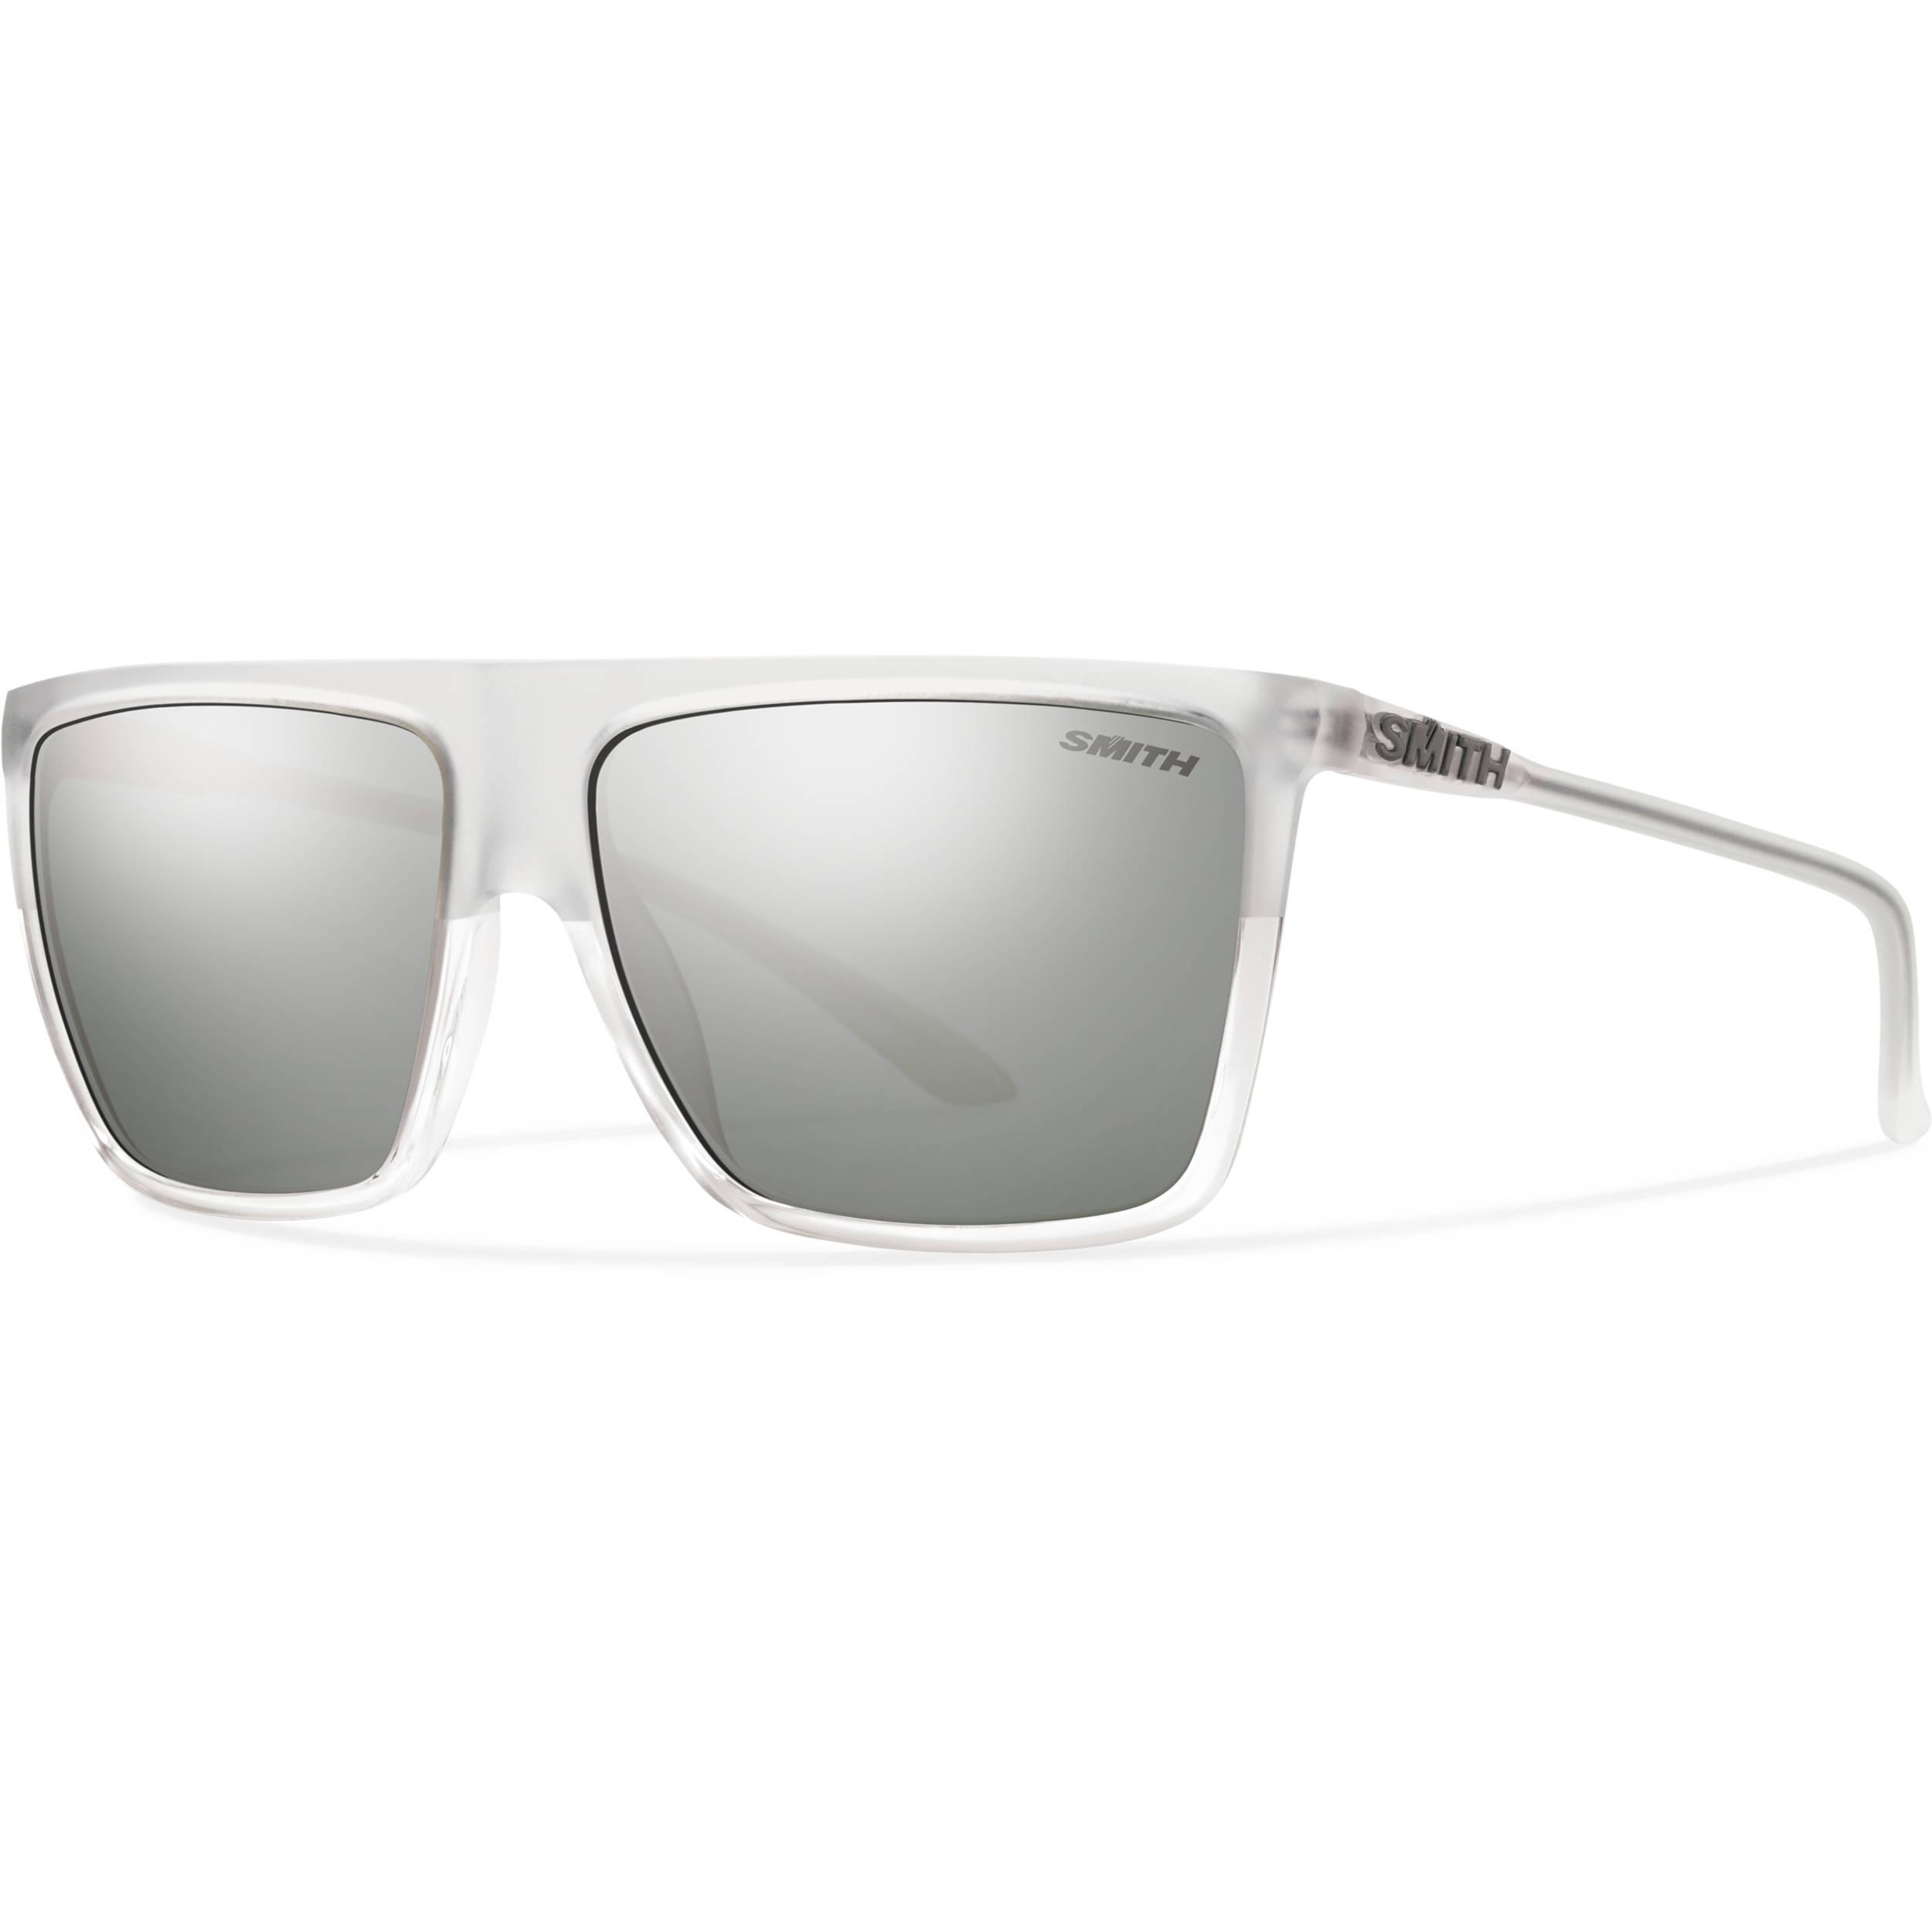 Smith Optics Cornice Sunglasses with Super Platinum CNPCSPTCRS